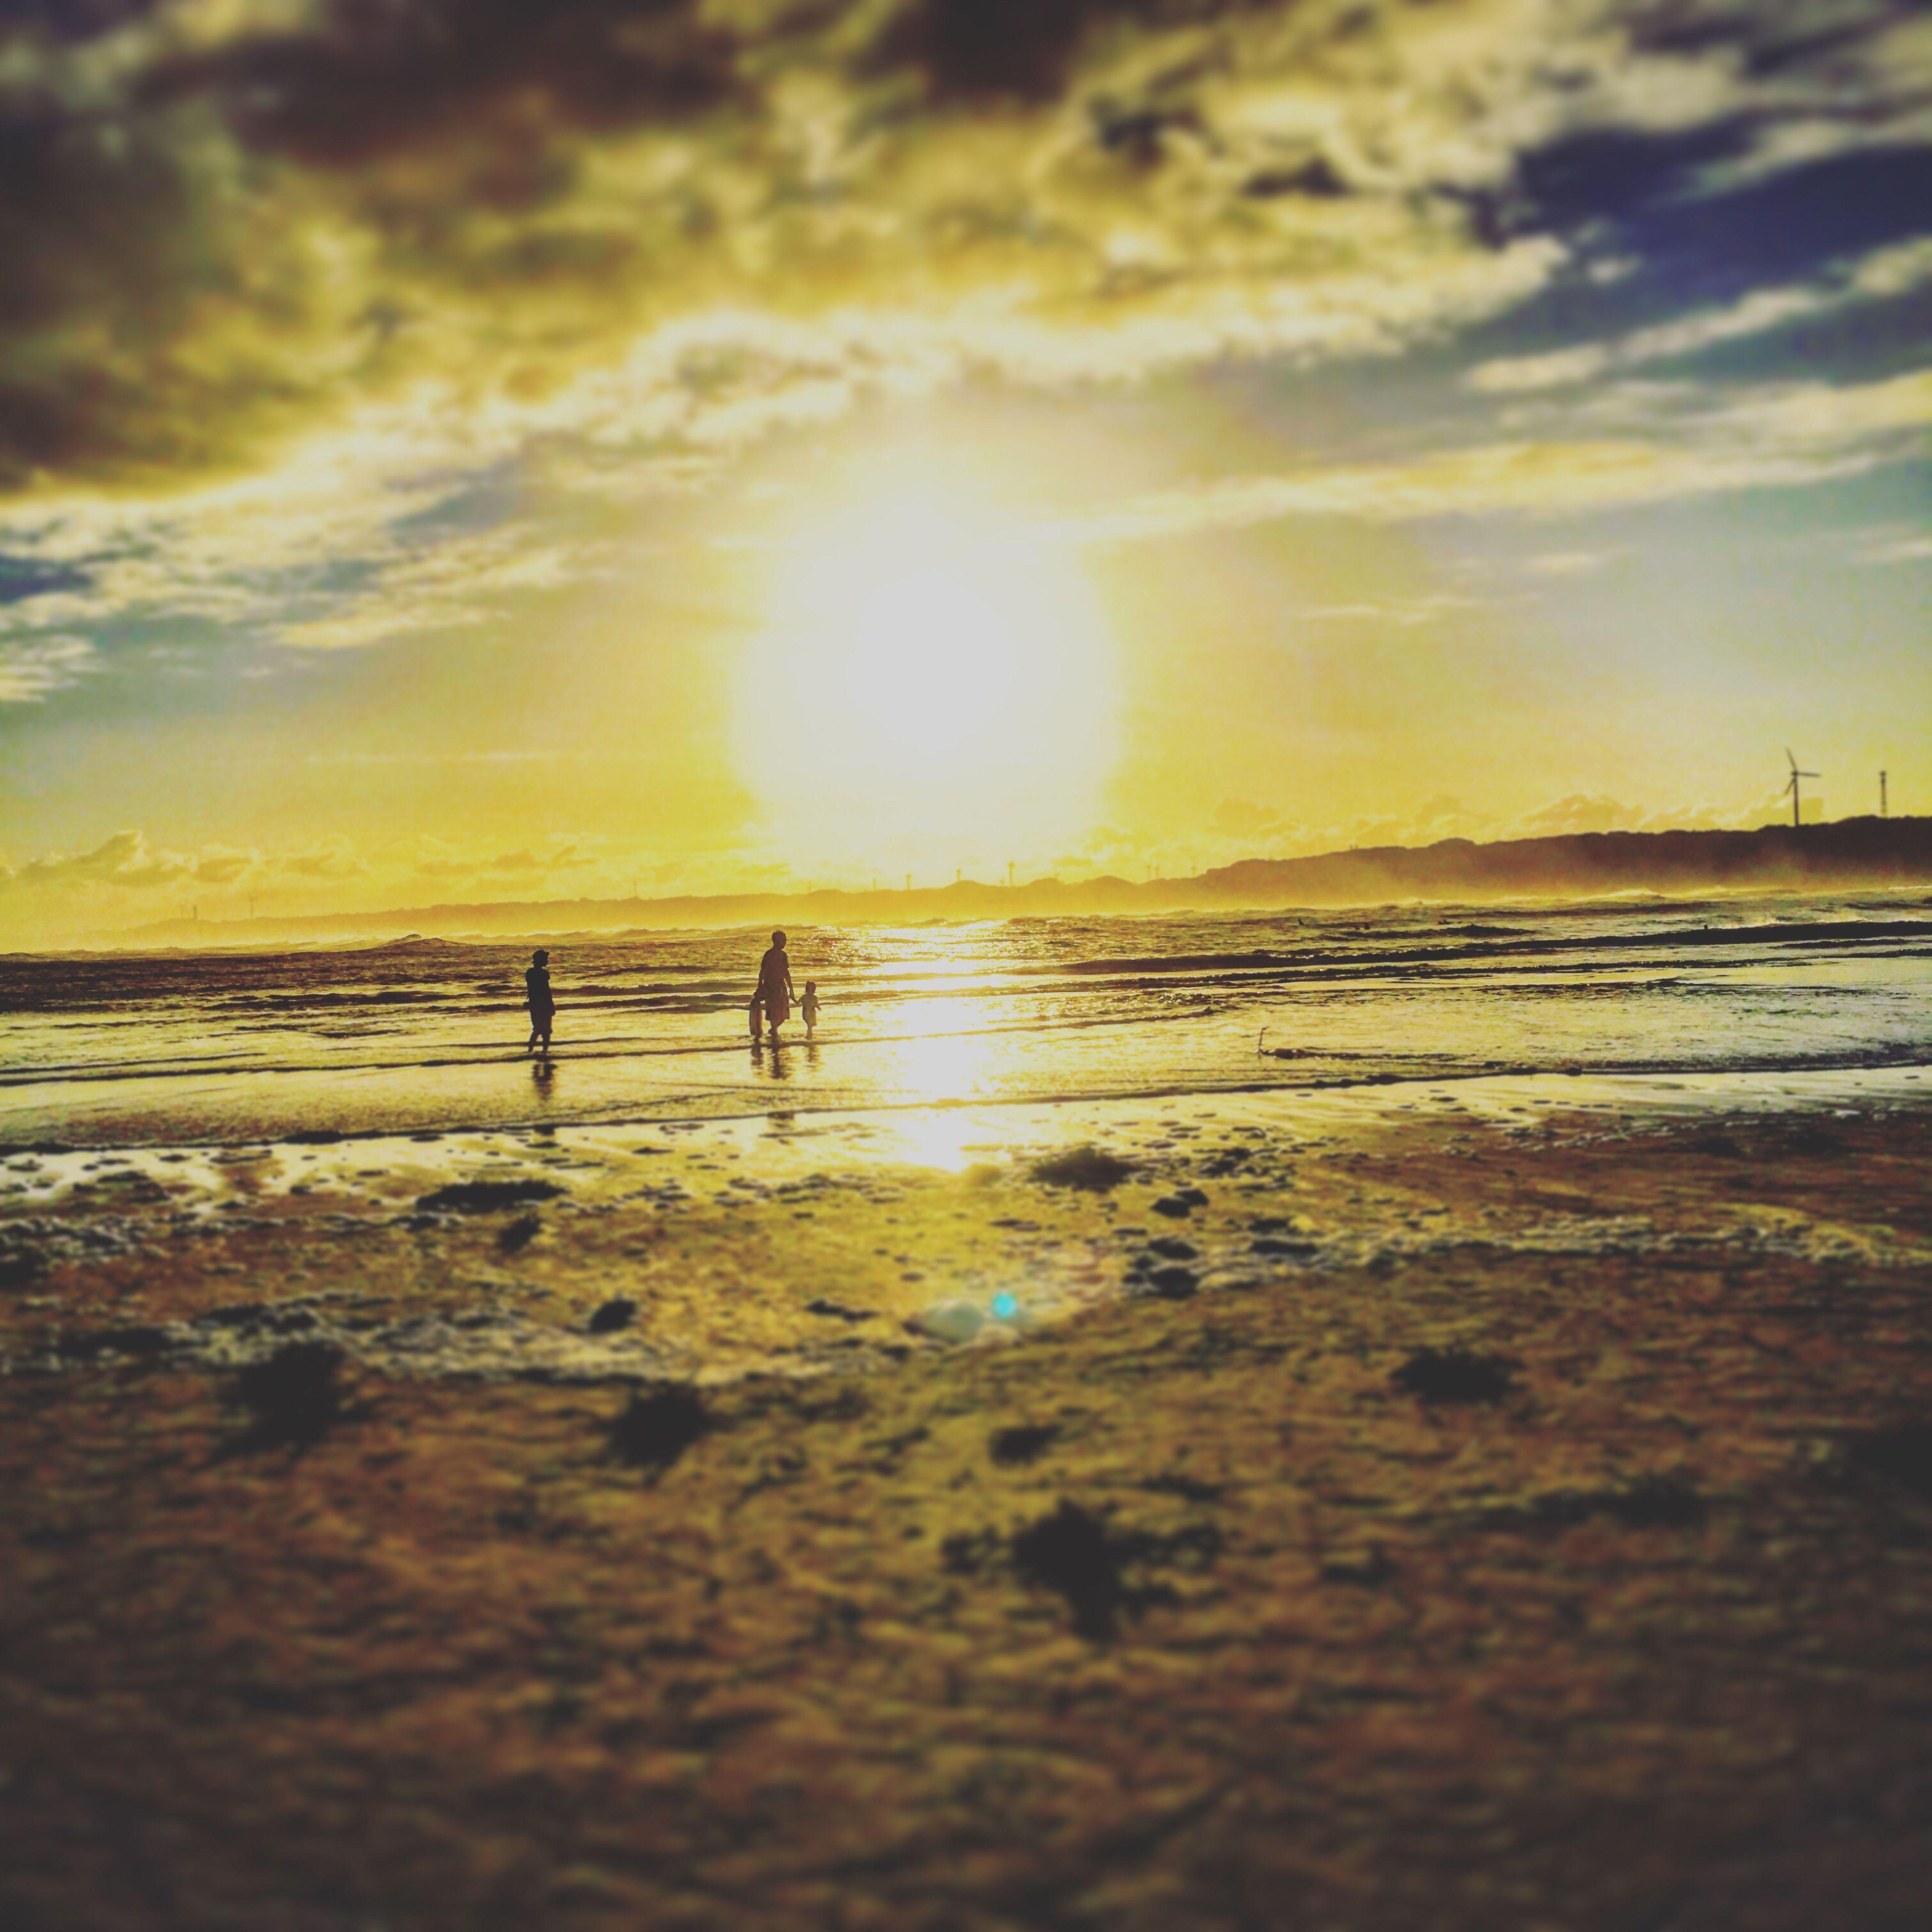 sunset, beach, sea, sun, vacations, water, scenics, tranquil scene, sand, tranquility, shore, tourism, walking, tide, coastline, majestic, idyllic, beauty in nature, calm, sky, travel destinations, reflection, tourist, nature, surface level, cloud - sky, coastal feature, sunbeam